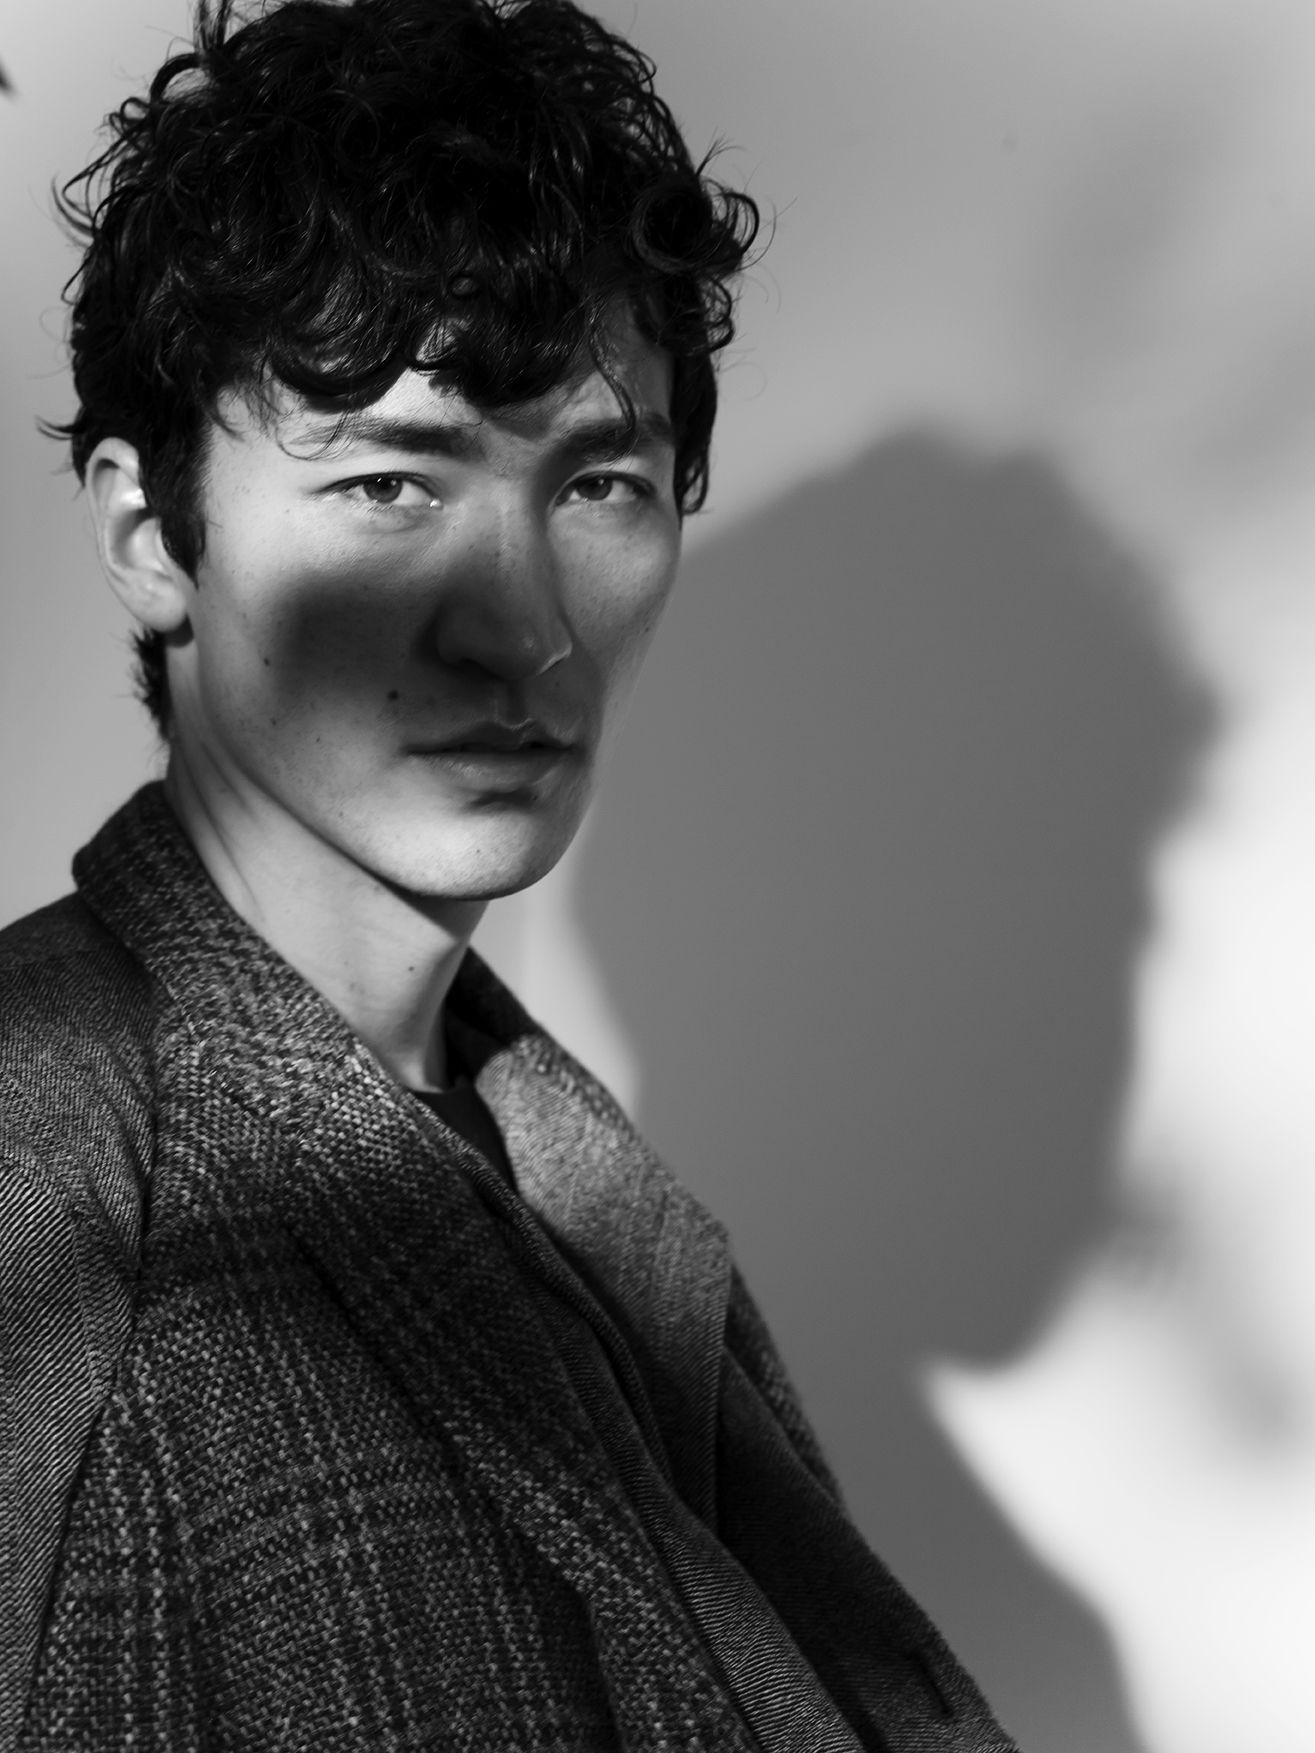 Photographer | Chien-Wen Lin Designer | Bei Kuo http://www.tomorrowistheendoftheworld.com/ Makeup Artist | Jonathan Wu Model | K